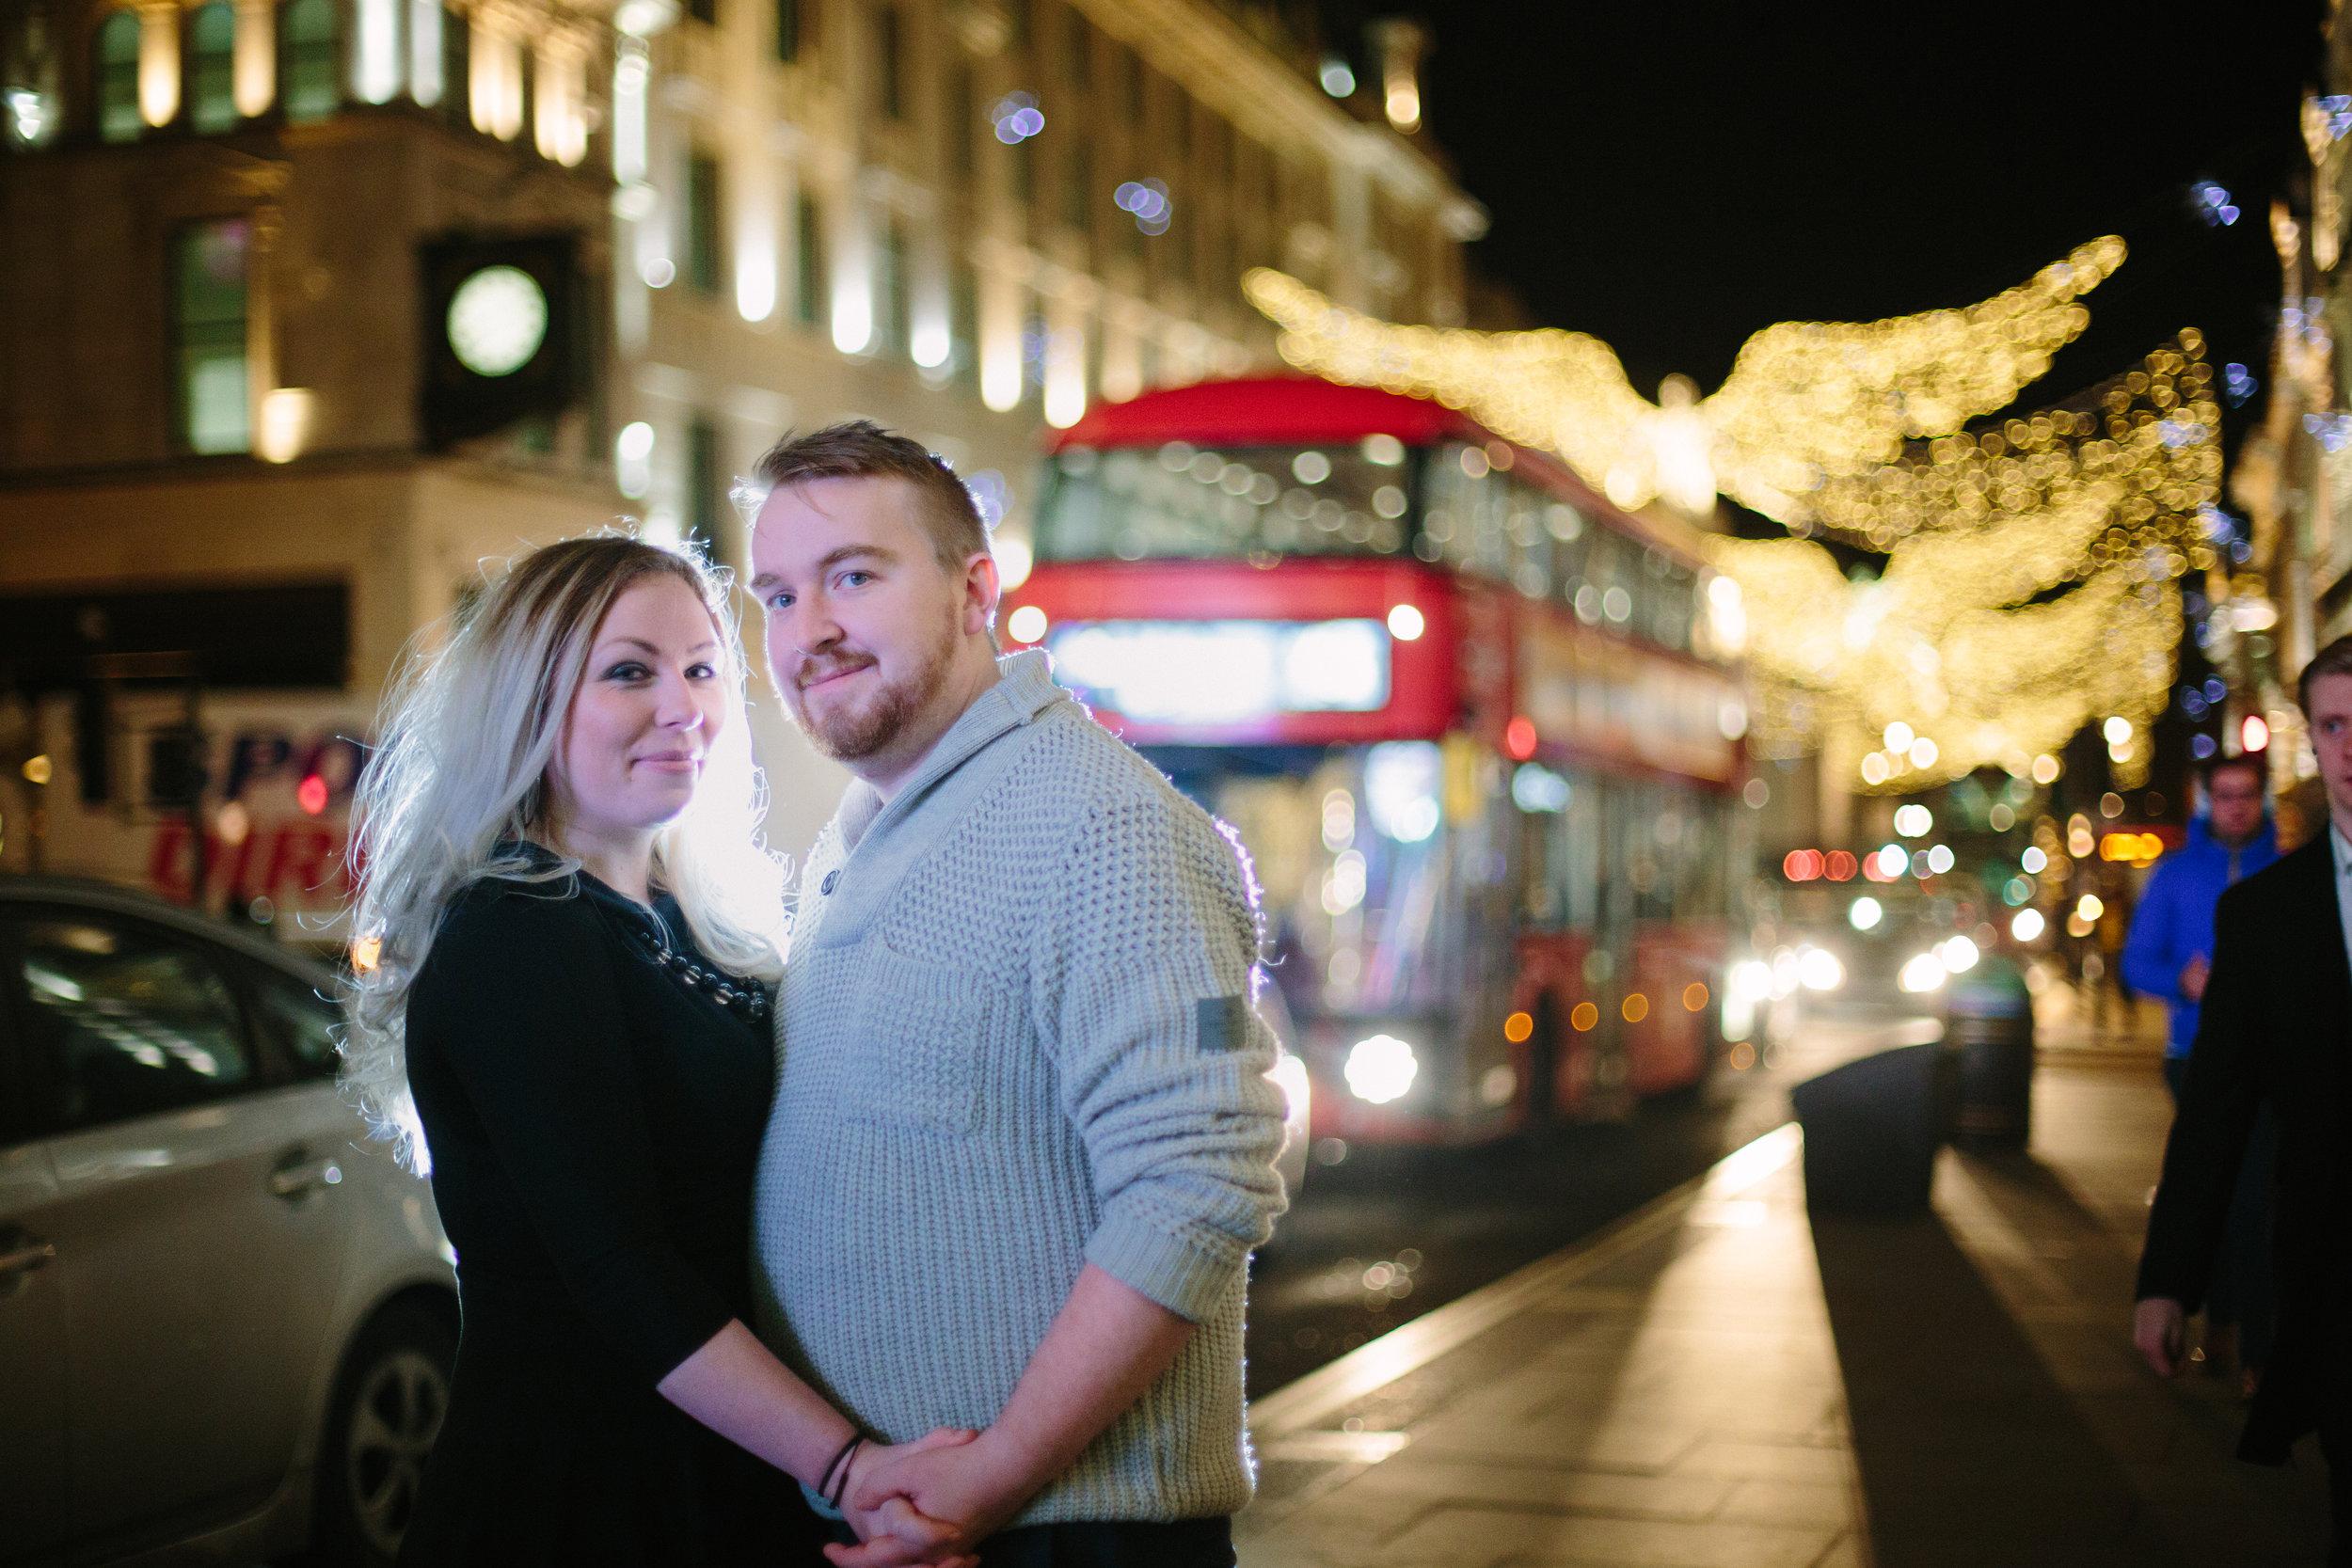 london-oxford-street-christmas-lights-engagement-wedding-photography-12